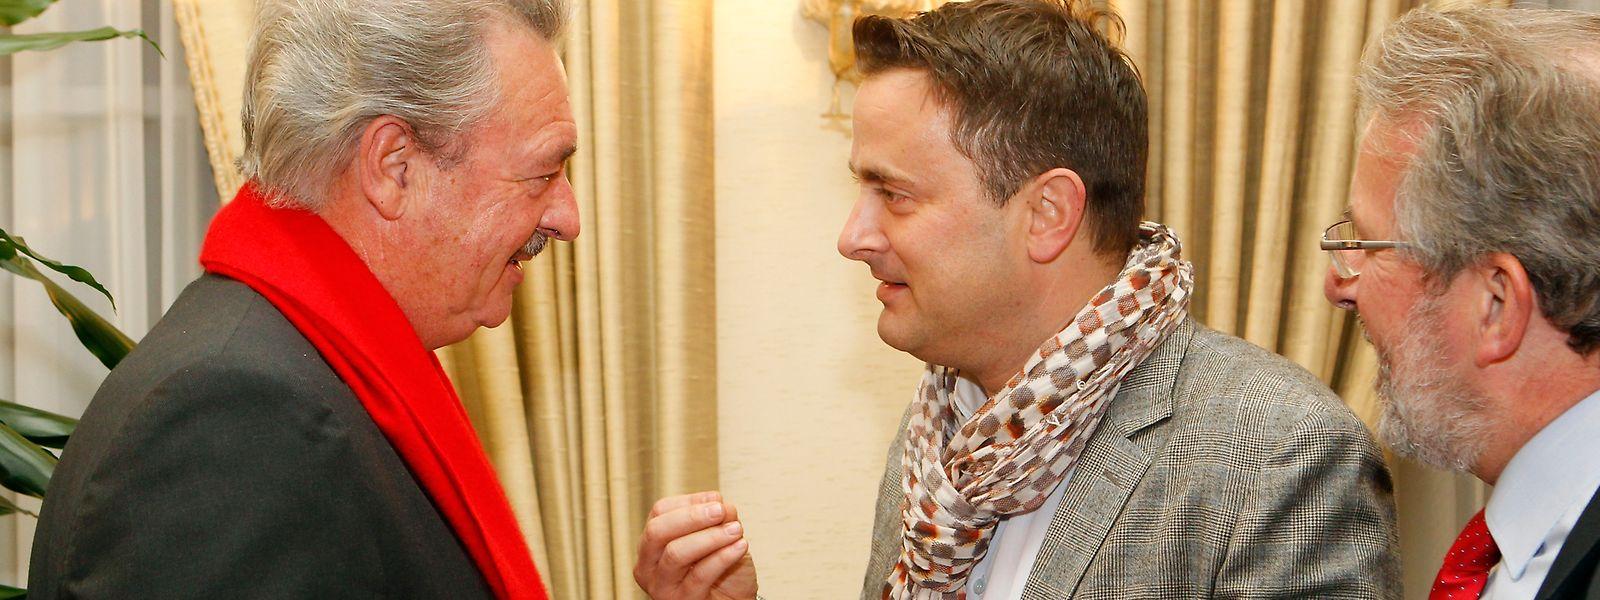 Jean Asselborn (l.), Mars Di Bartolomeo (r.) und Xavier Bettel sind Luxemburgs populärste Politiker.